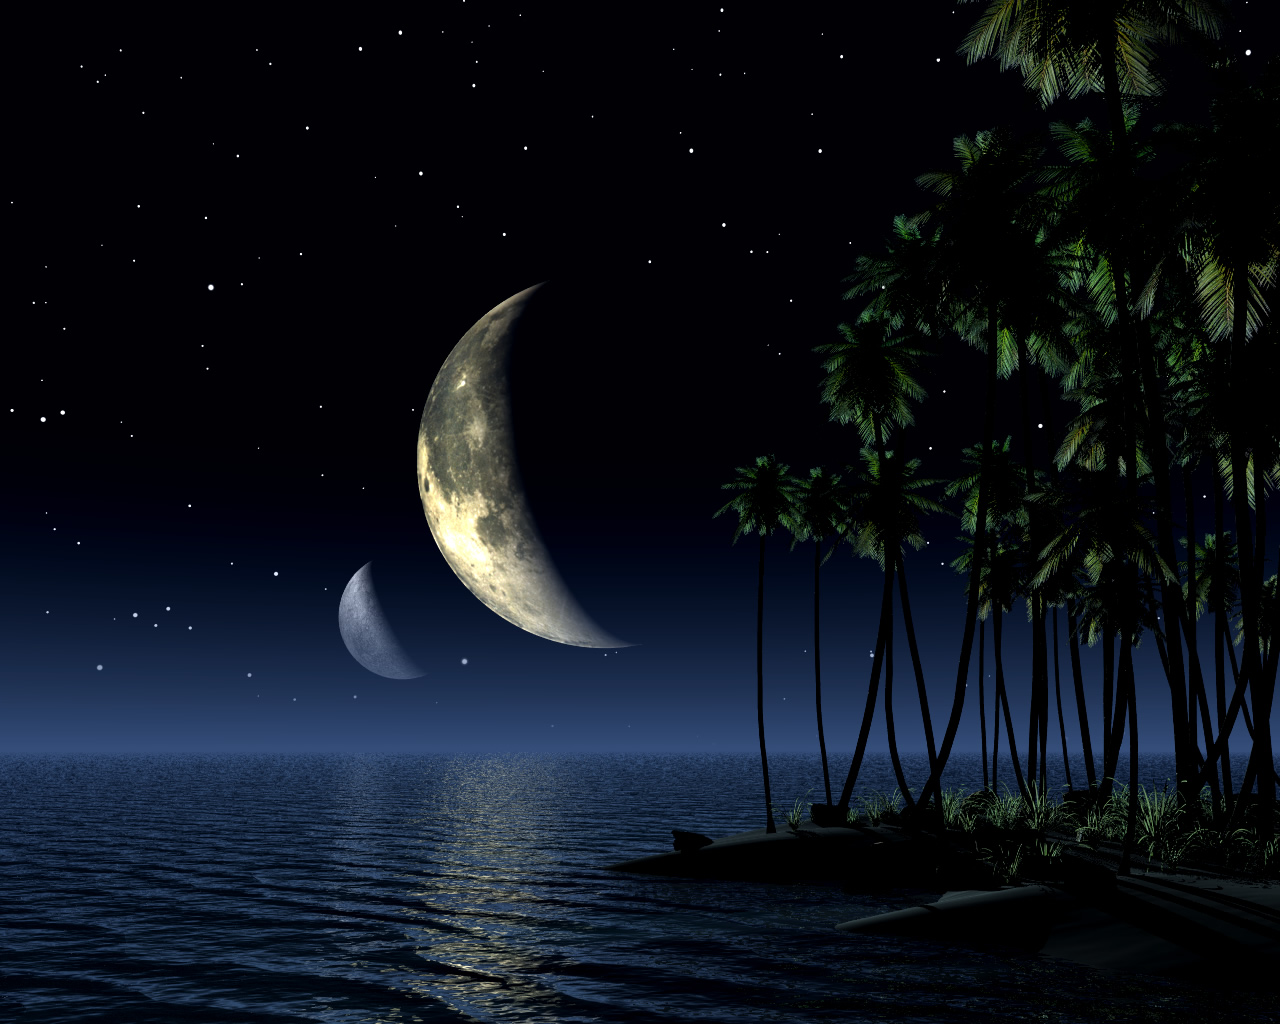 http://2.bp.blogspot.com/-7kN4LI6H4tg/UFIVdu7bTAI/AAAAAAAAIhQ/rhFPzDc_Kvg/s1600/3d-landscape_bafac2b3.jpg